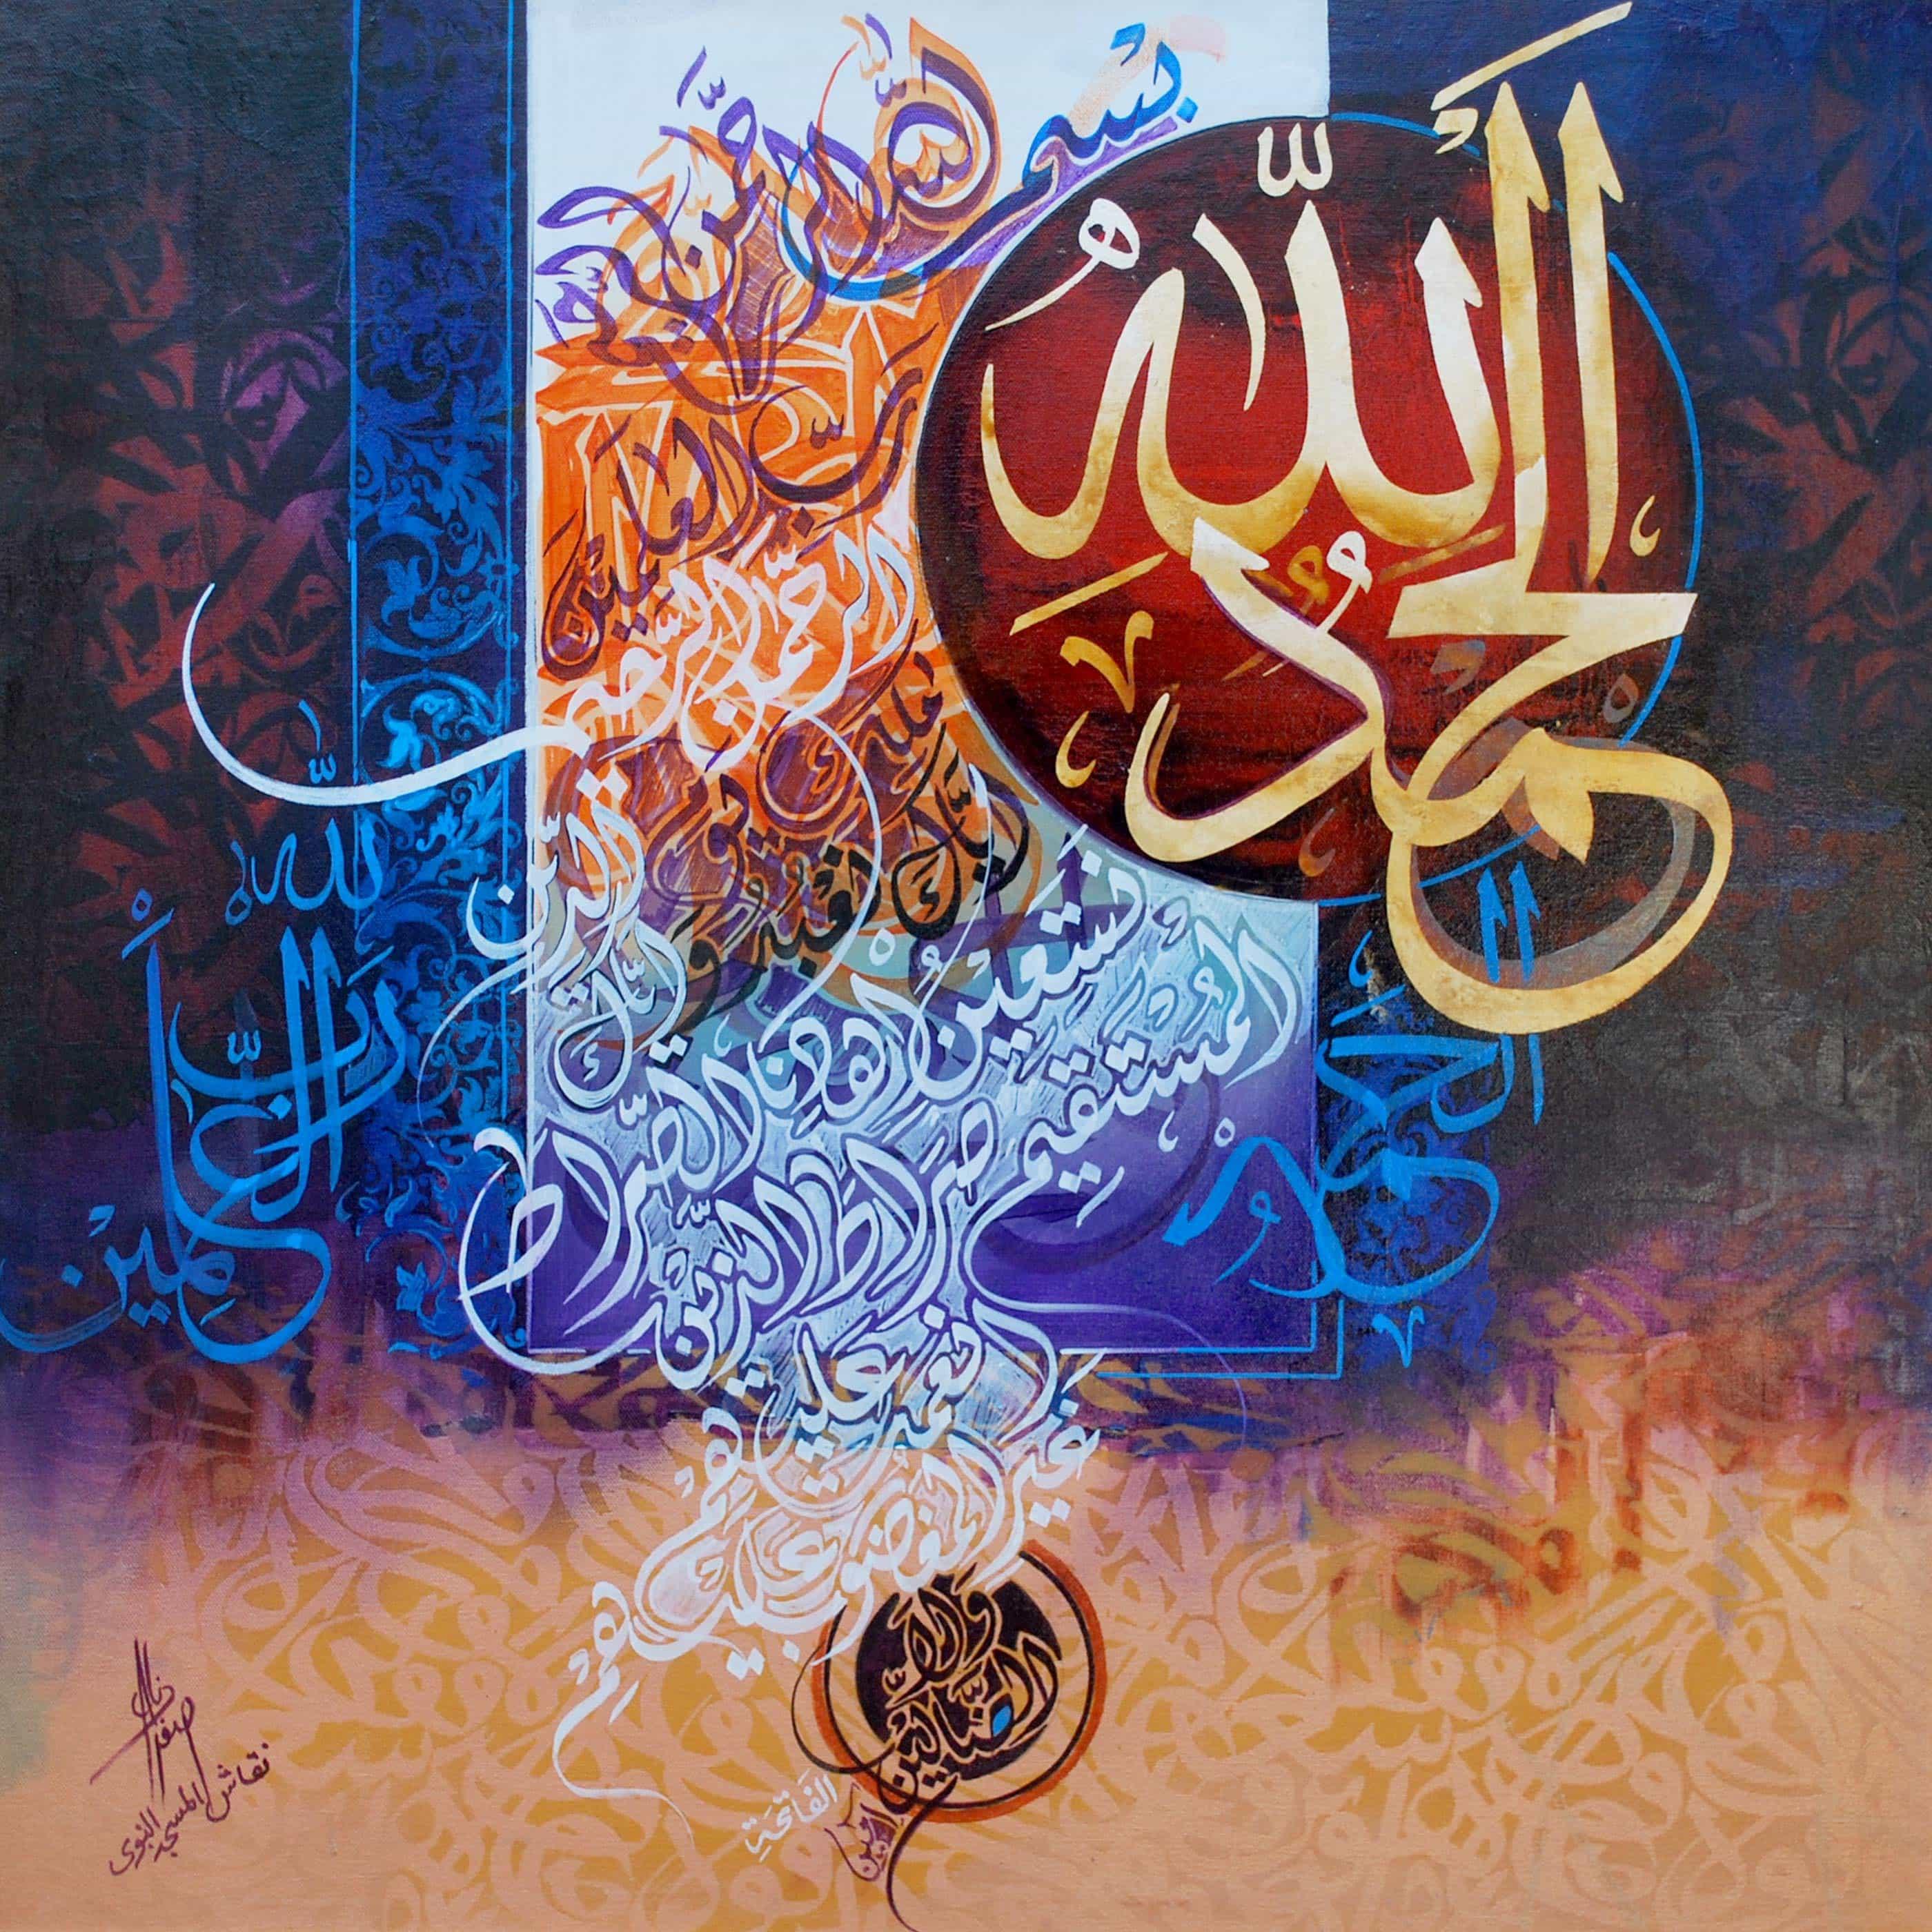 Asghar Ali Calligraphy